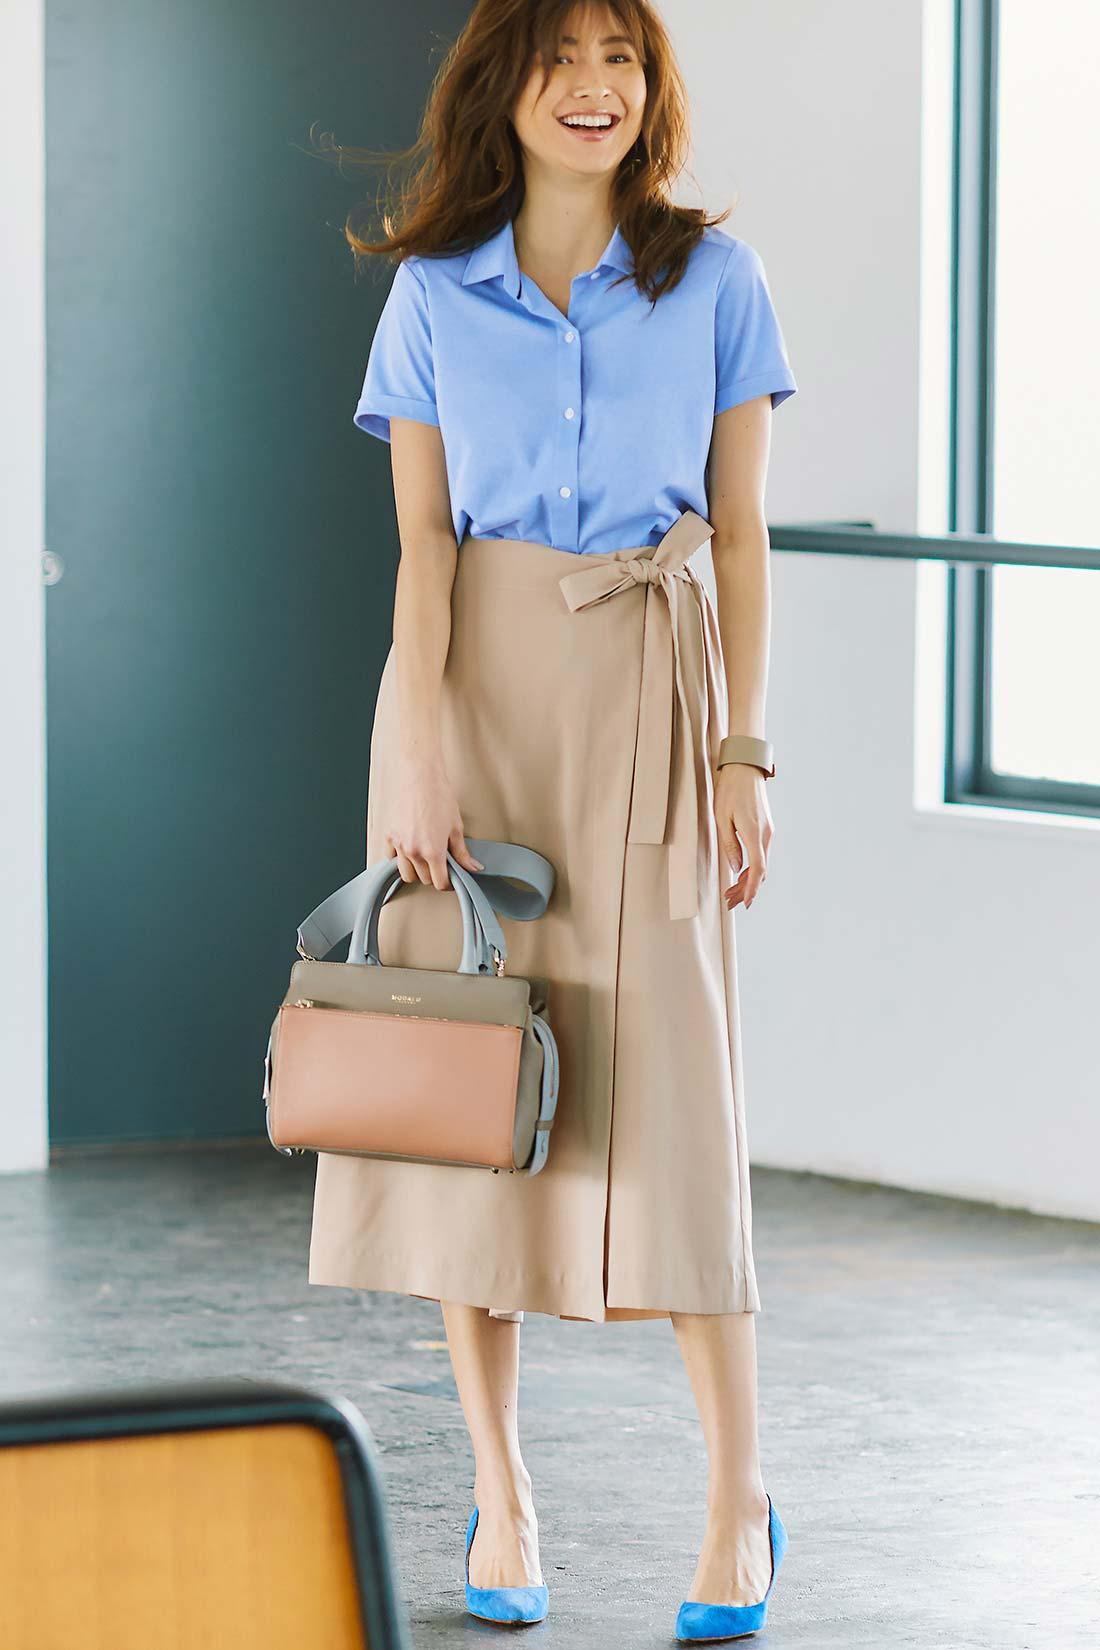 Tシャツ級の着心地と、端正な美シルエット。ウエストインすれば知的な着映えスタイルが完成。